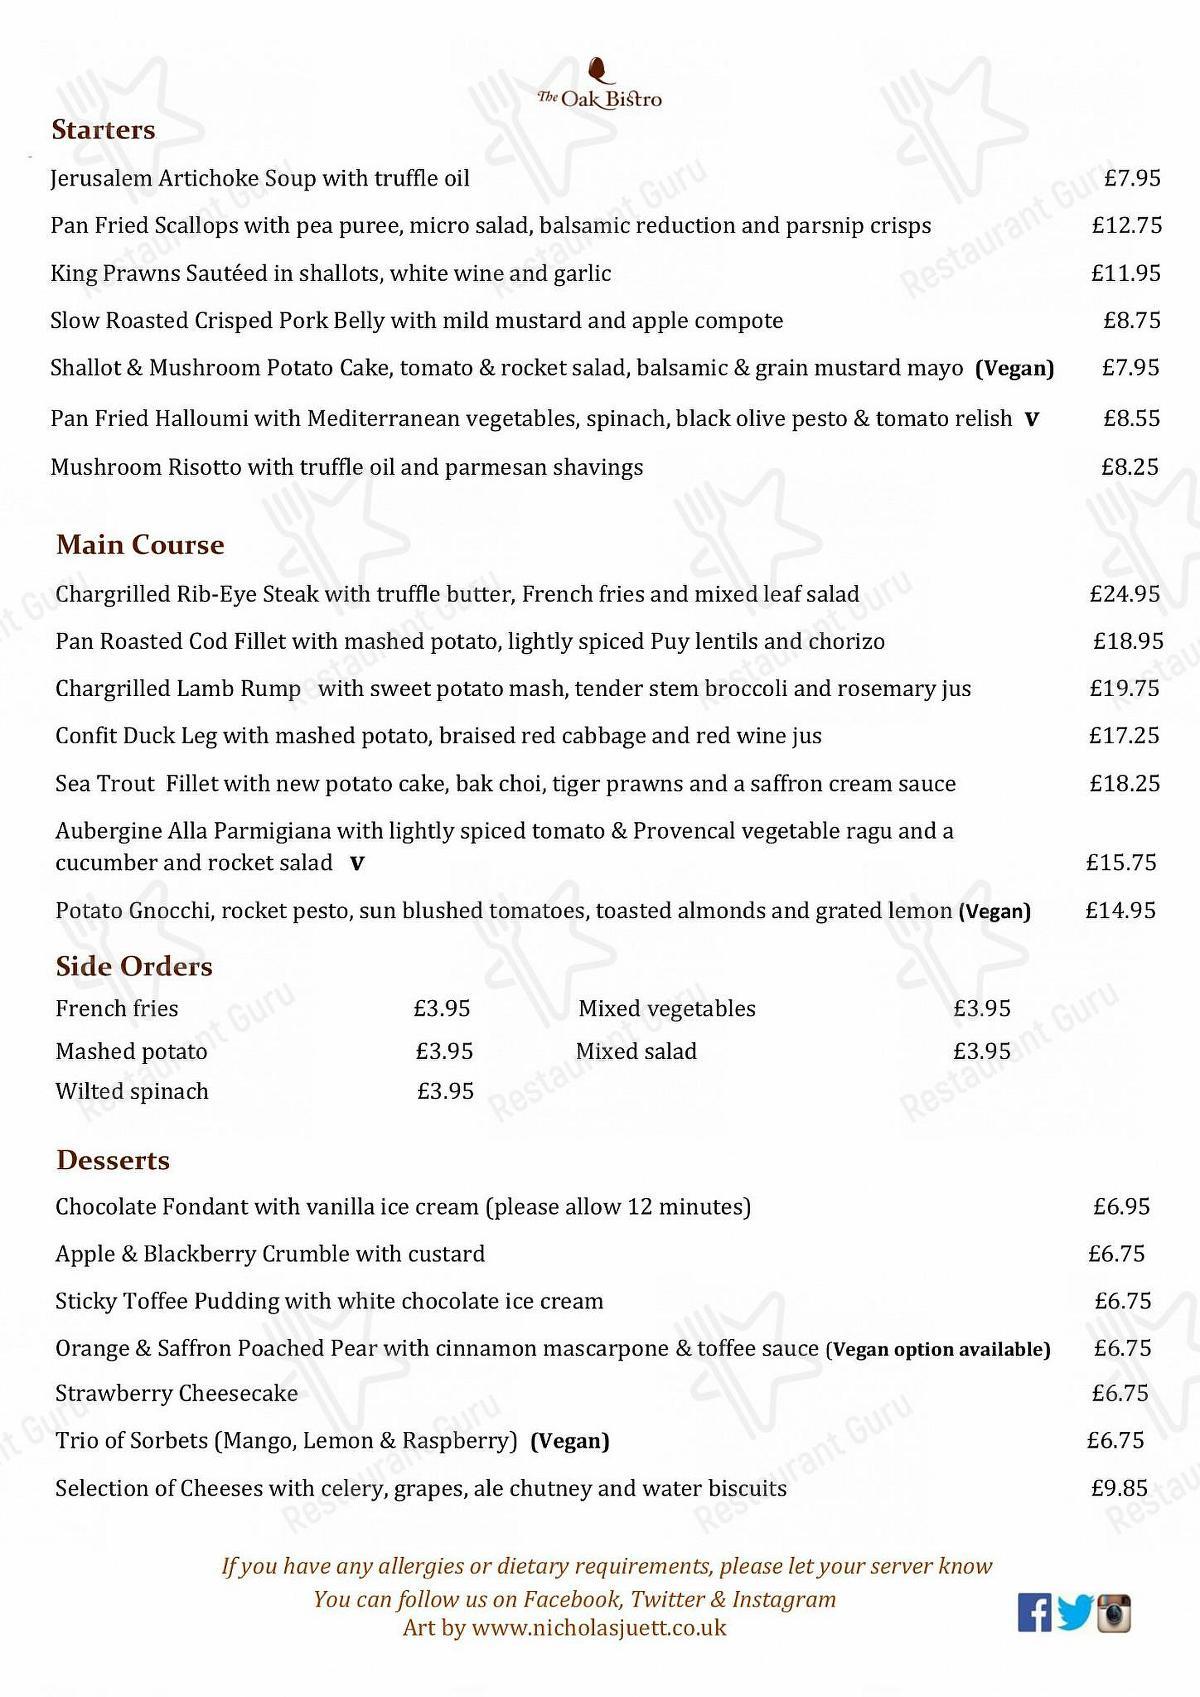 Menu for the The Oak Bistro restaurant